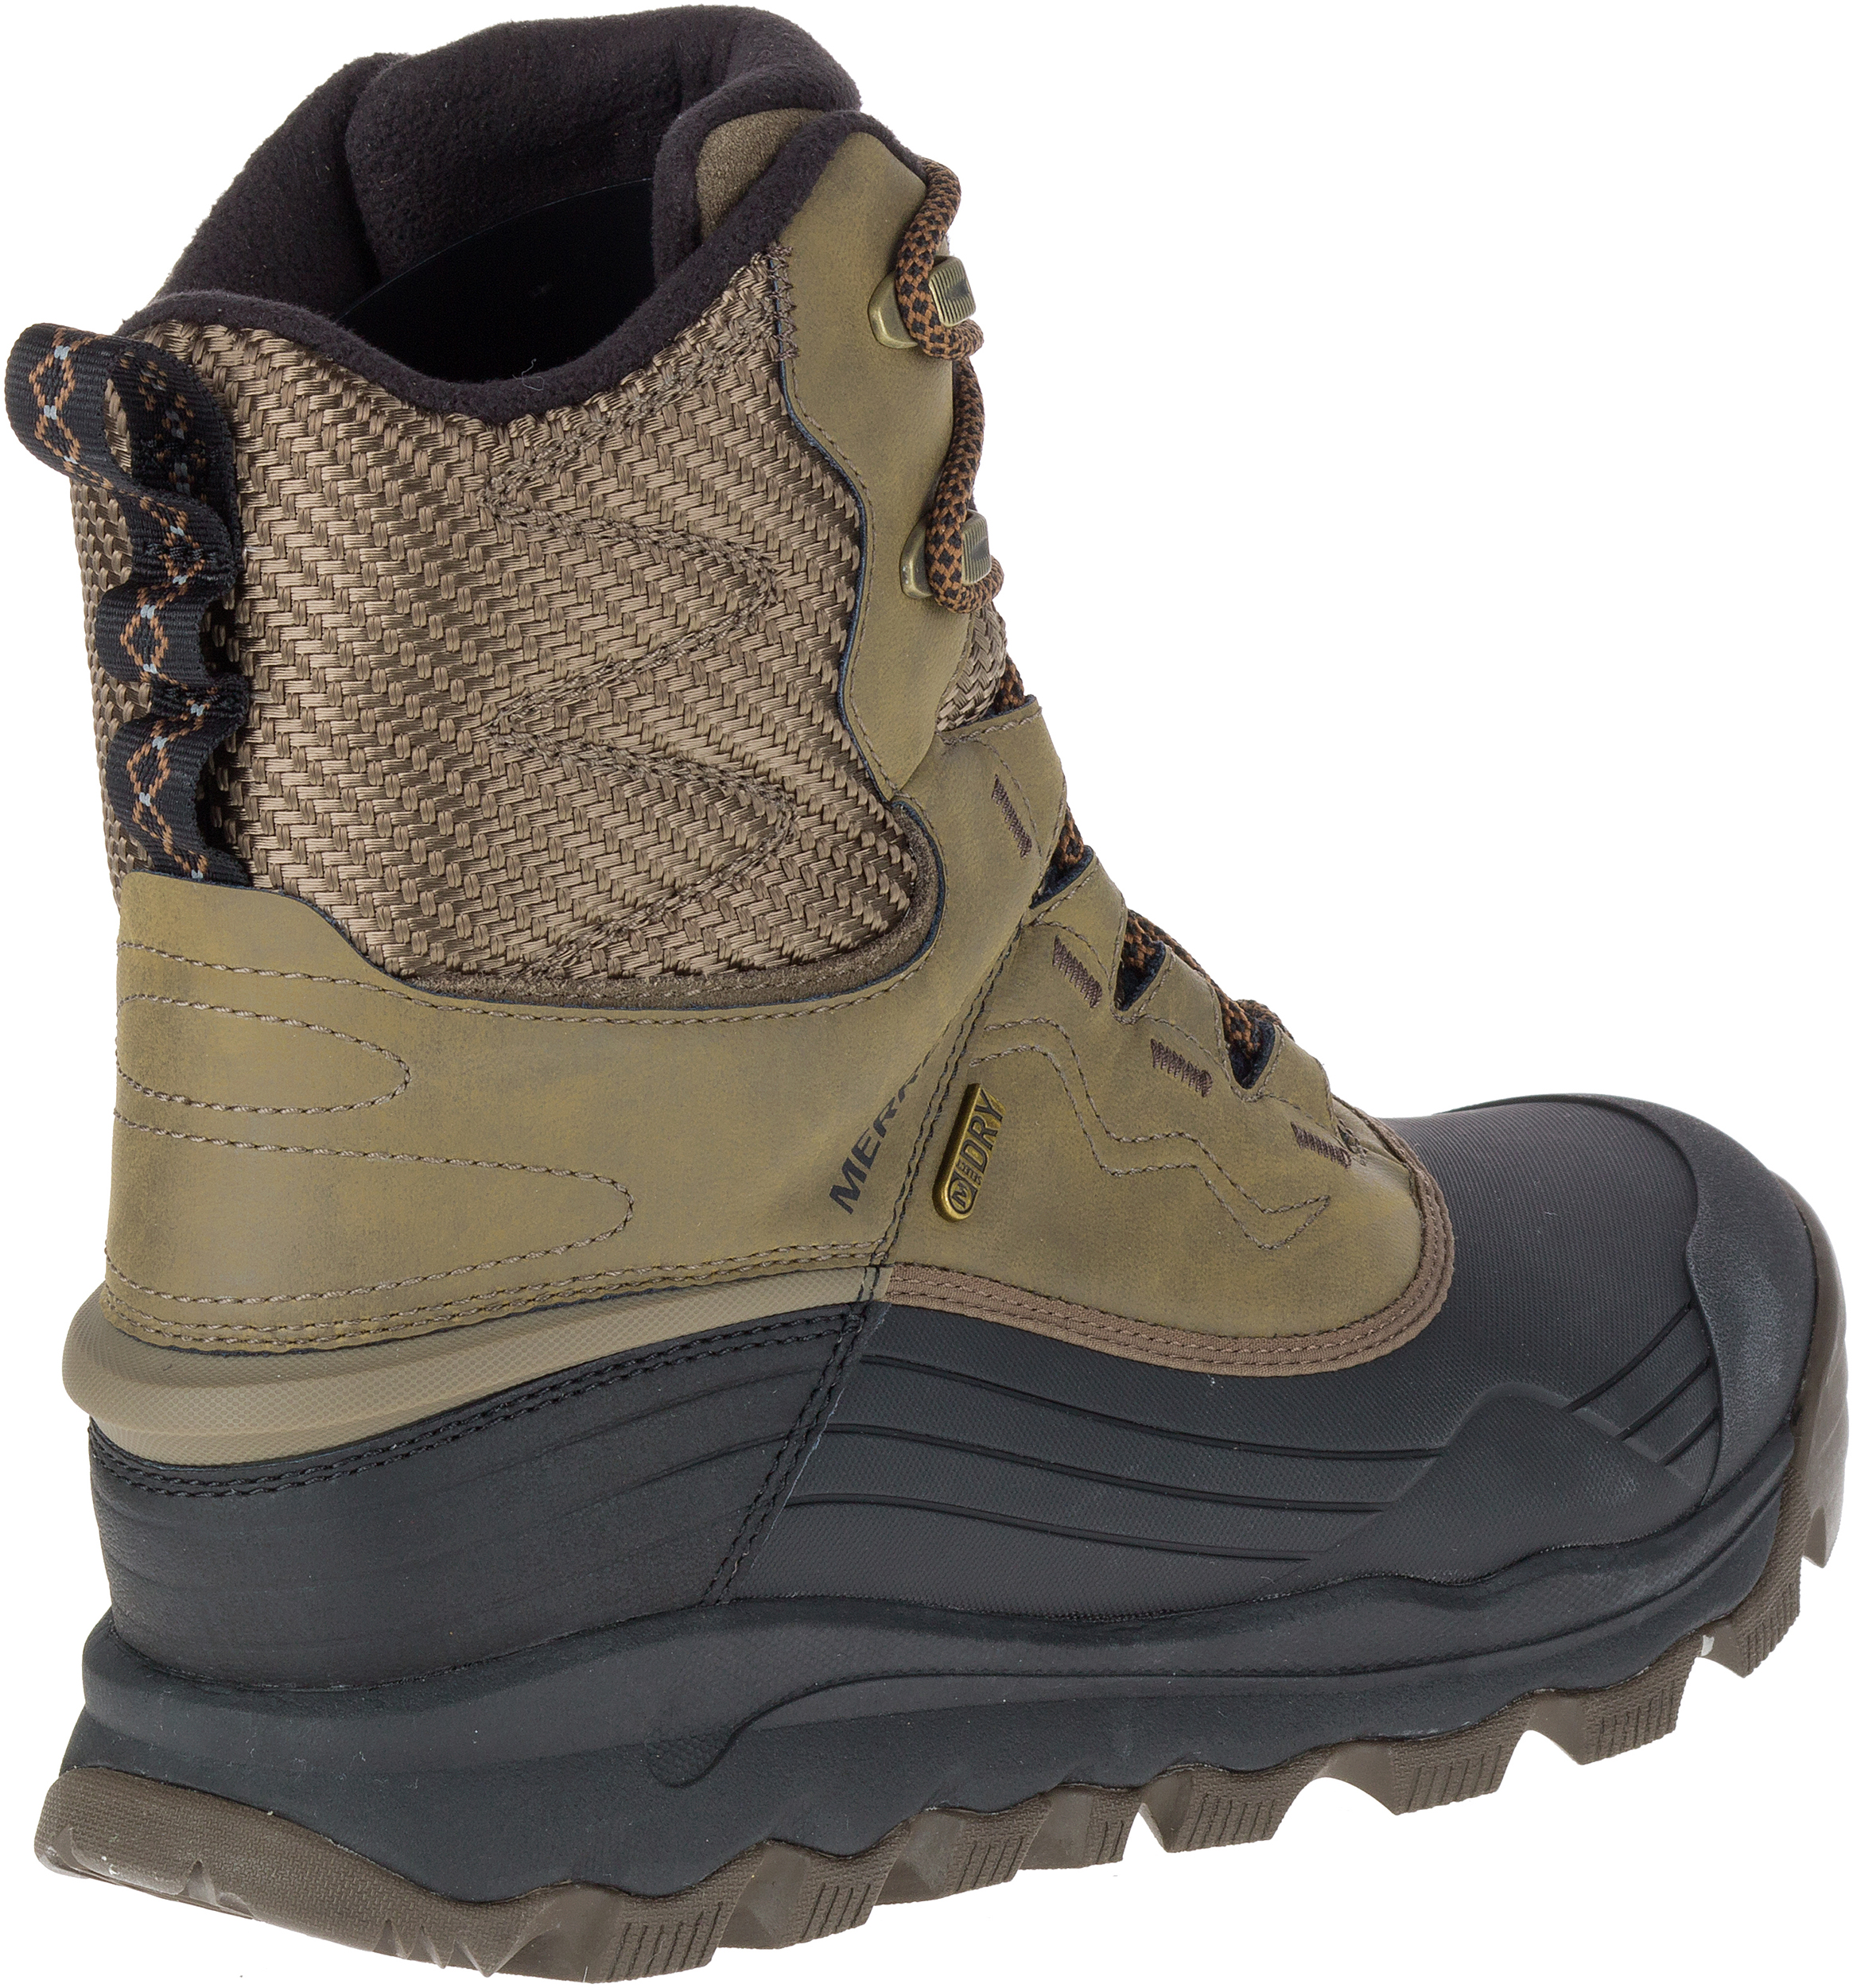 Merrell Thermo Vortex 6 Waterproof Chaussures de Randonn/ée Hautes Femme